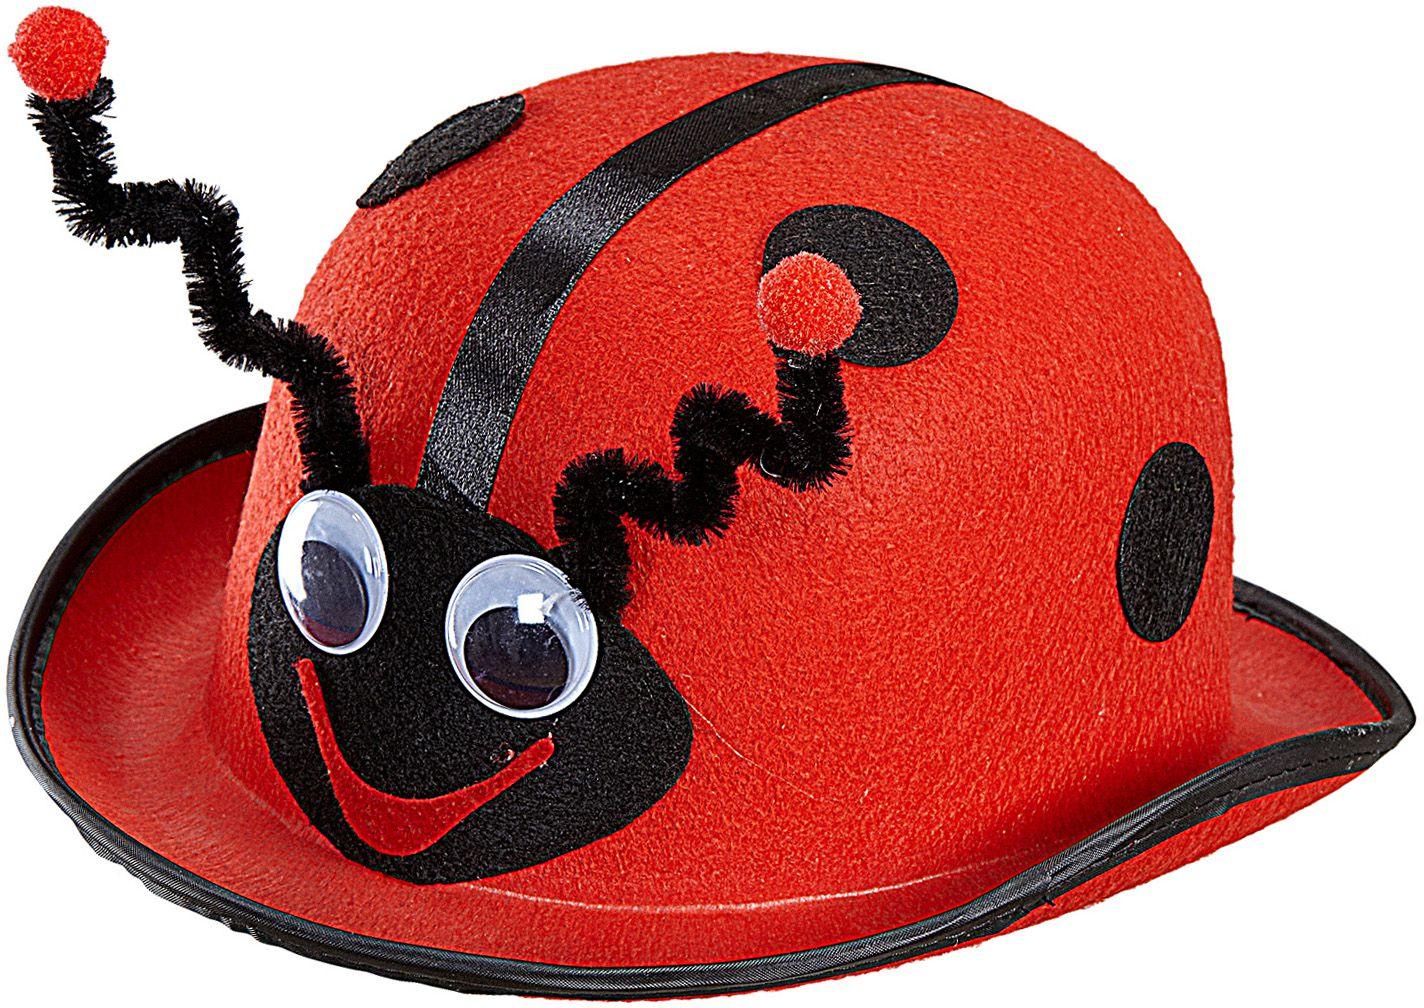 Rode lieveheersbeestje bolhoed